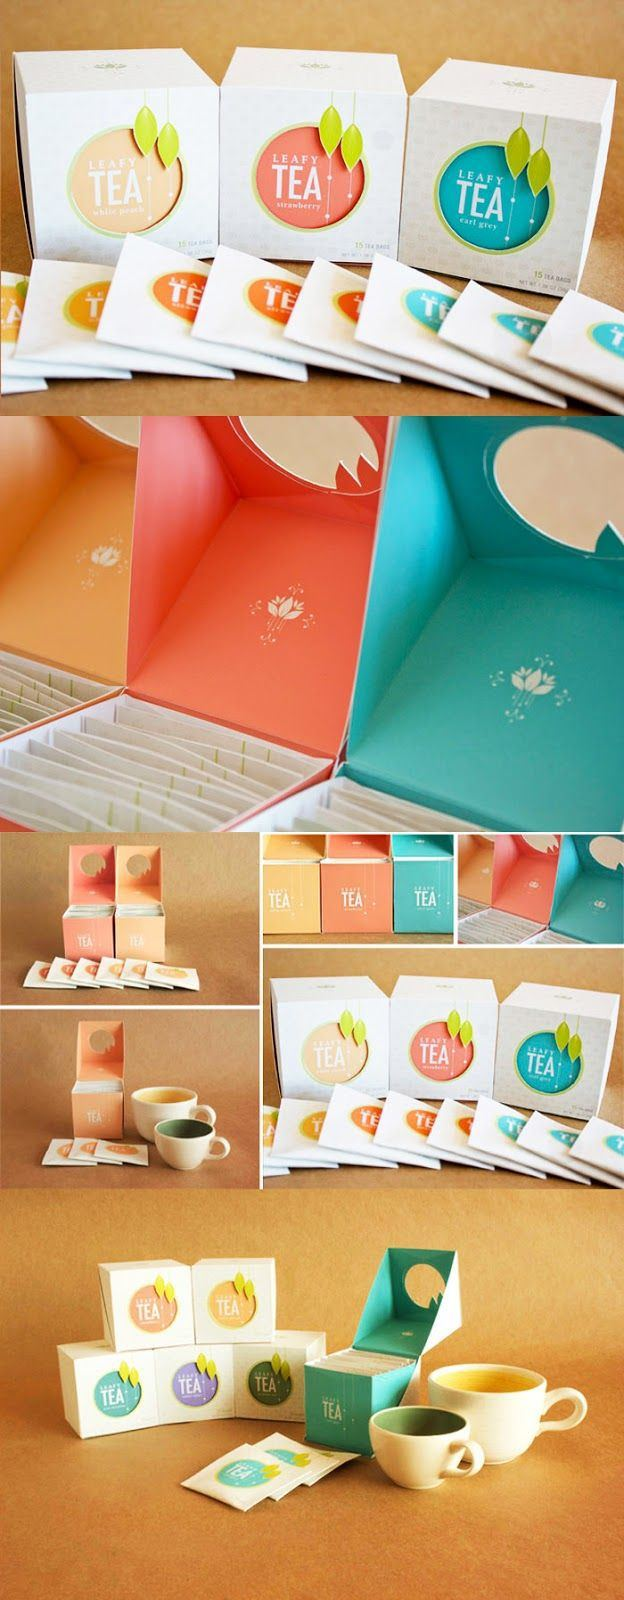 packaging-tea-graphic-design